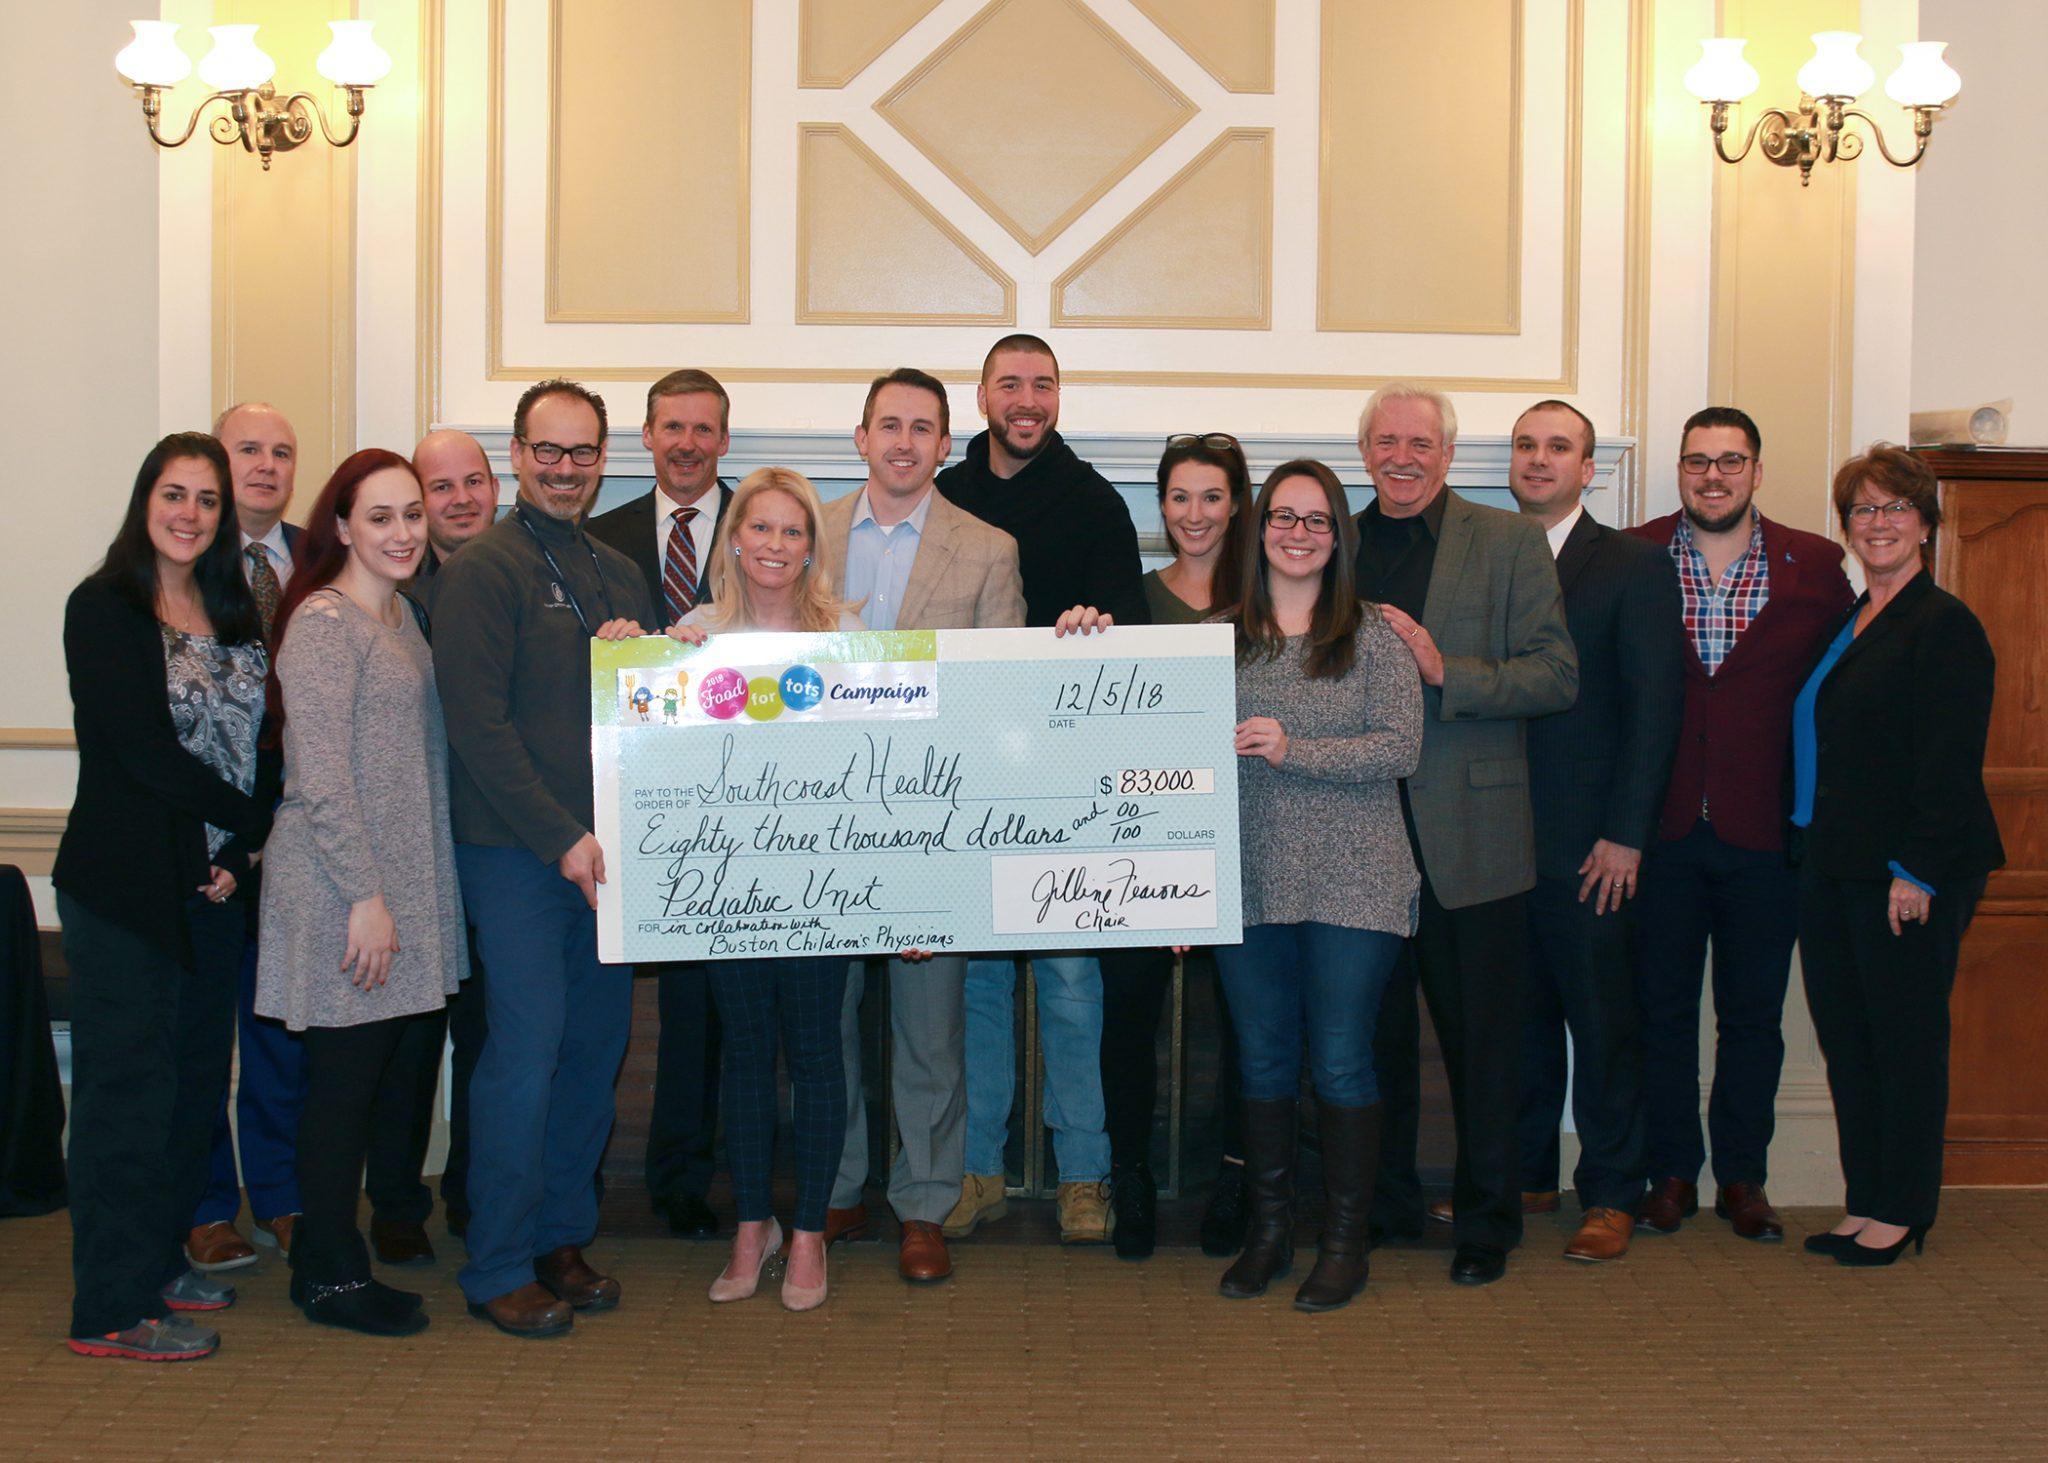 Food for Tots donates $83K to Southcoast Health pediatric